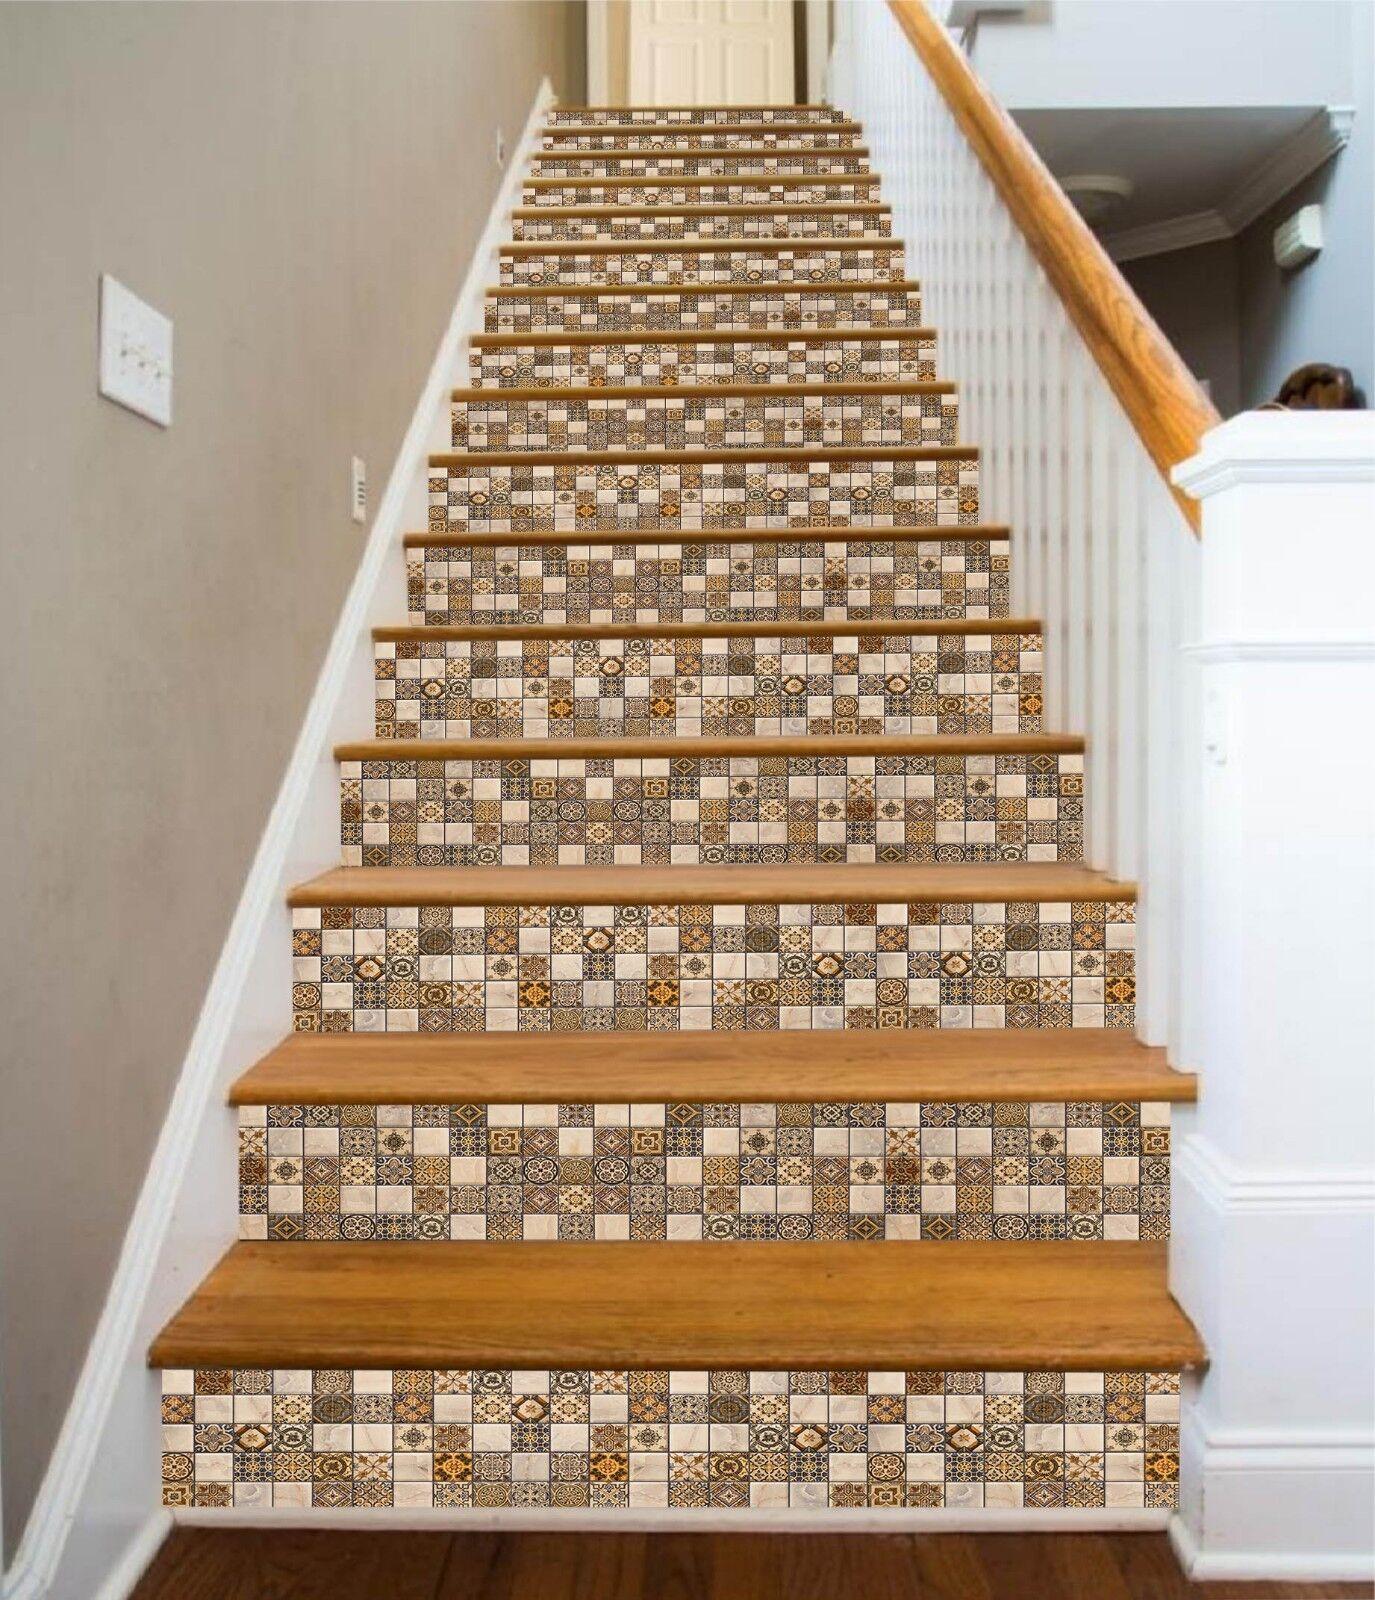 3D Metope Blaume 7 Fliese Marmor Stair Risers Fototapete Vinyl Aufkleber Tapete